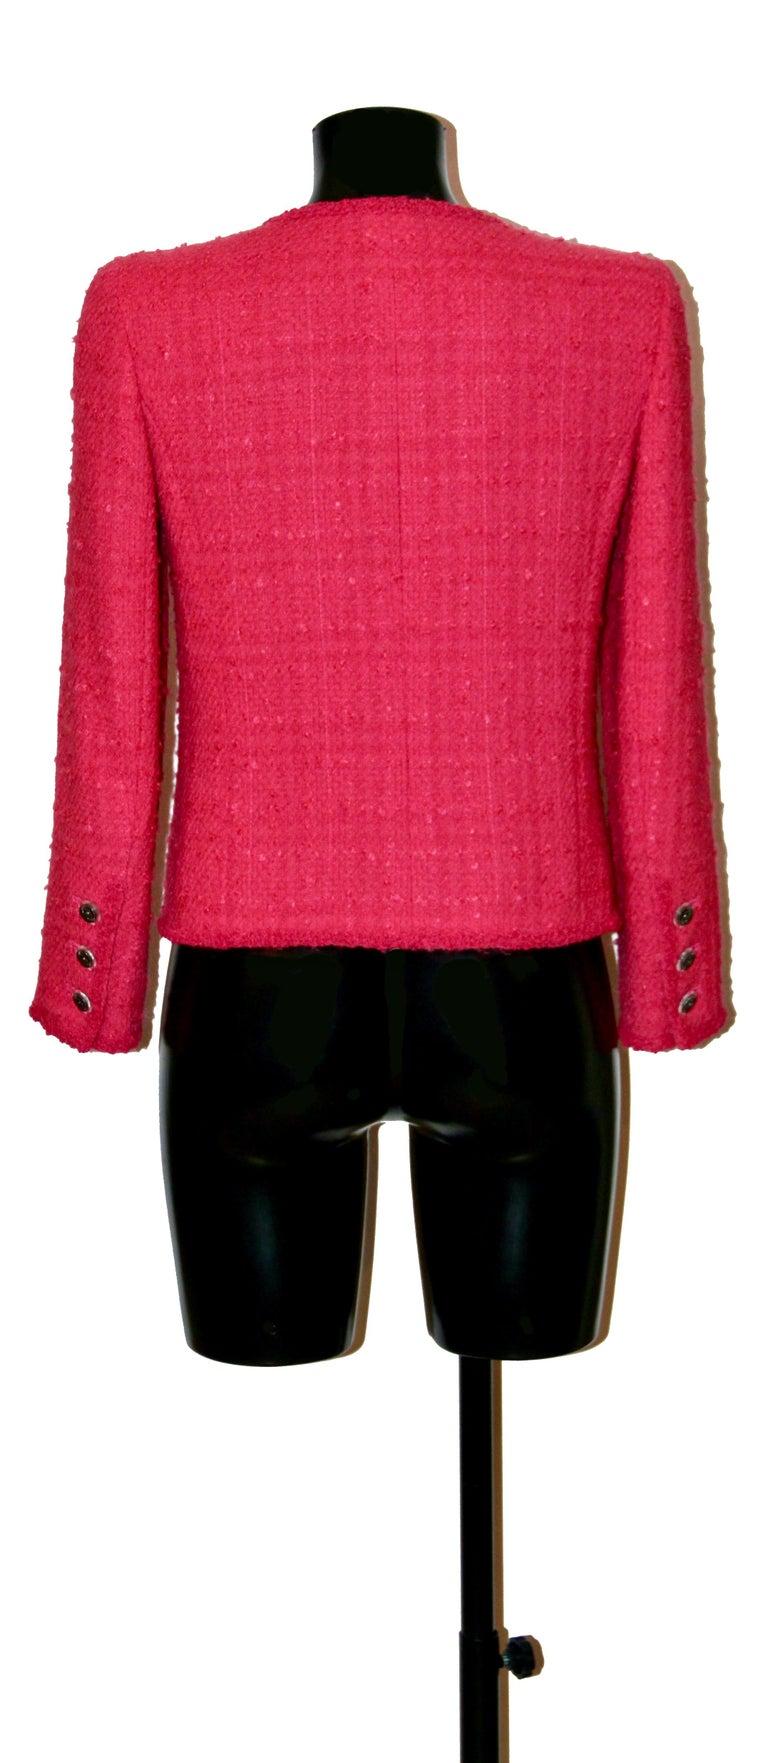 Great classic wool tweed jacket